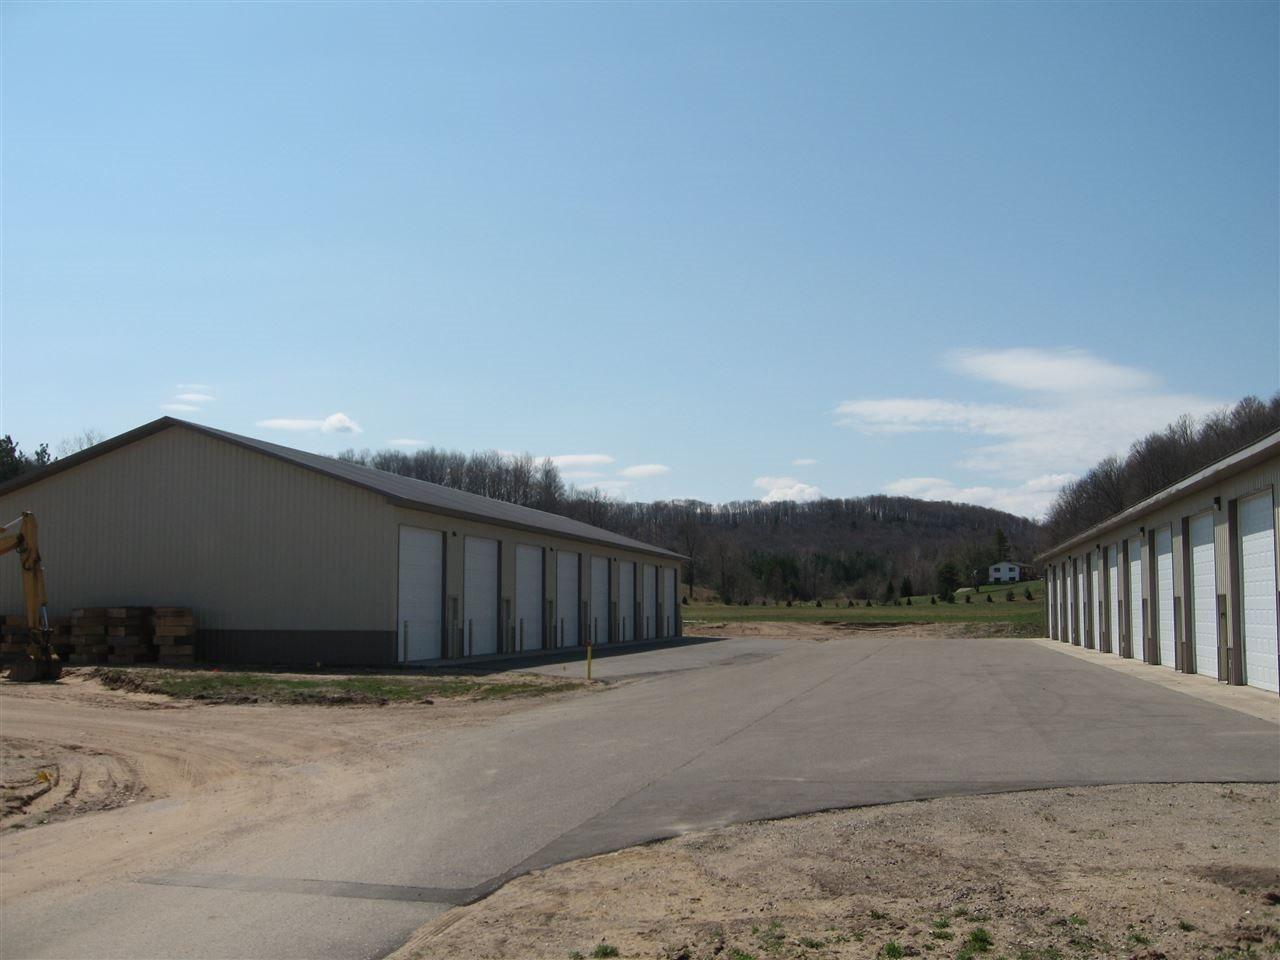 00040 Boyne Valley Storage Drive, Boyne City, MI 49712